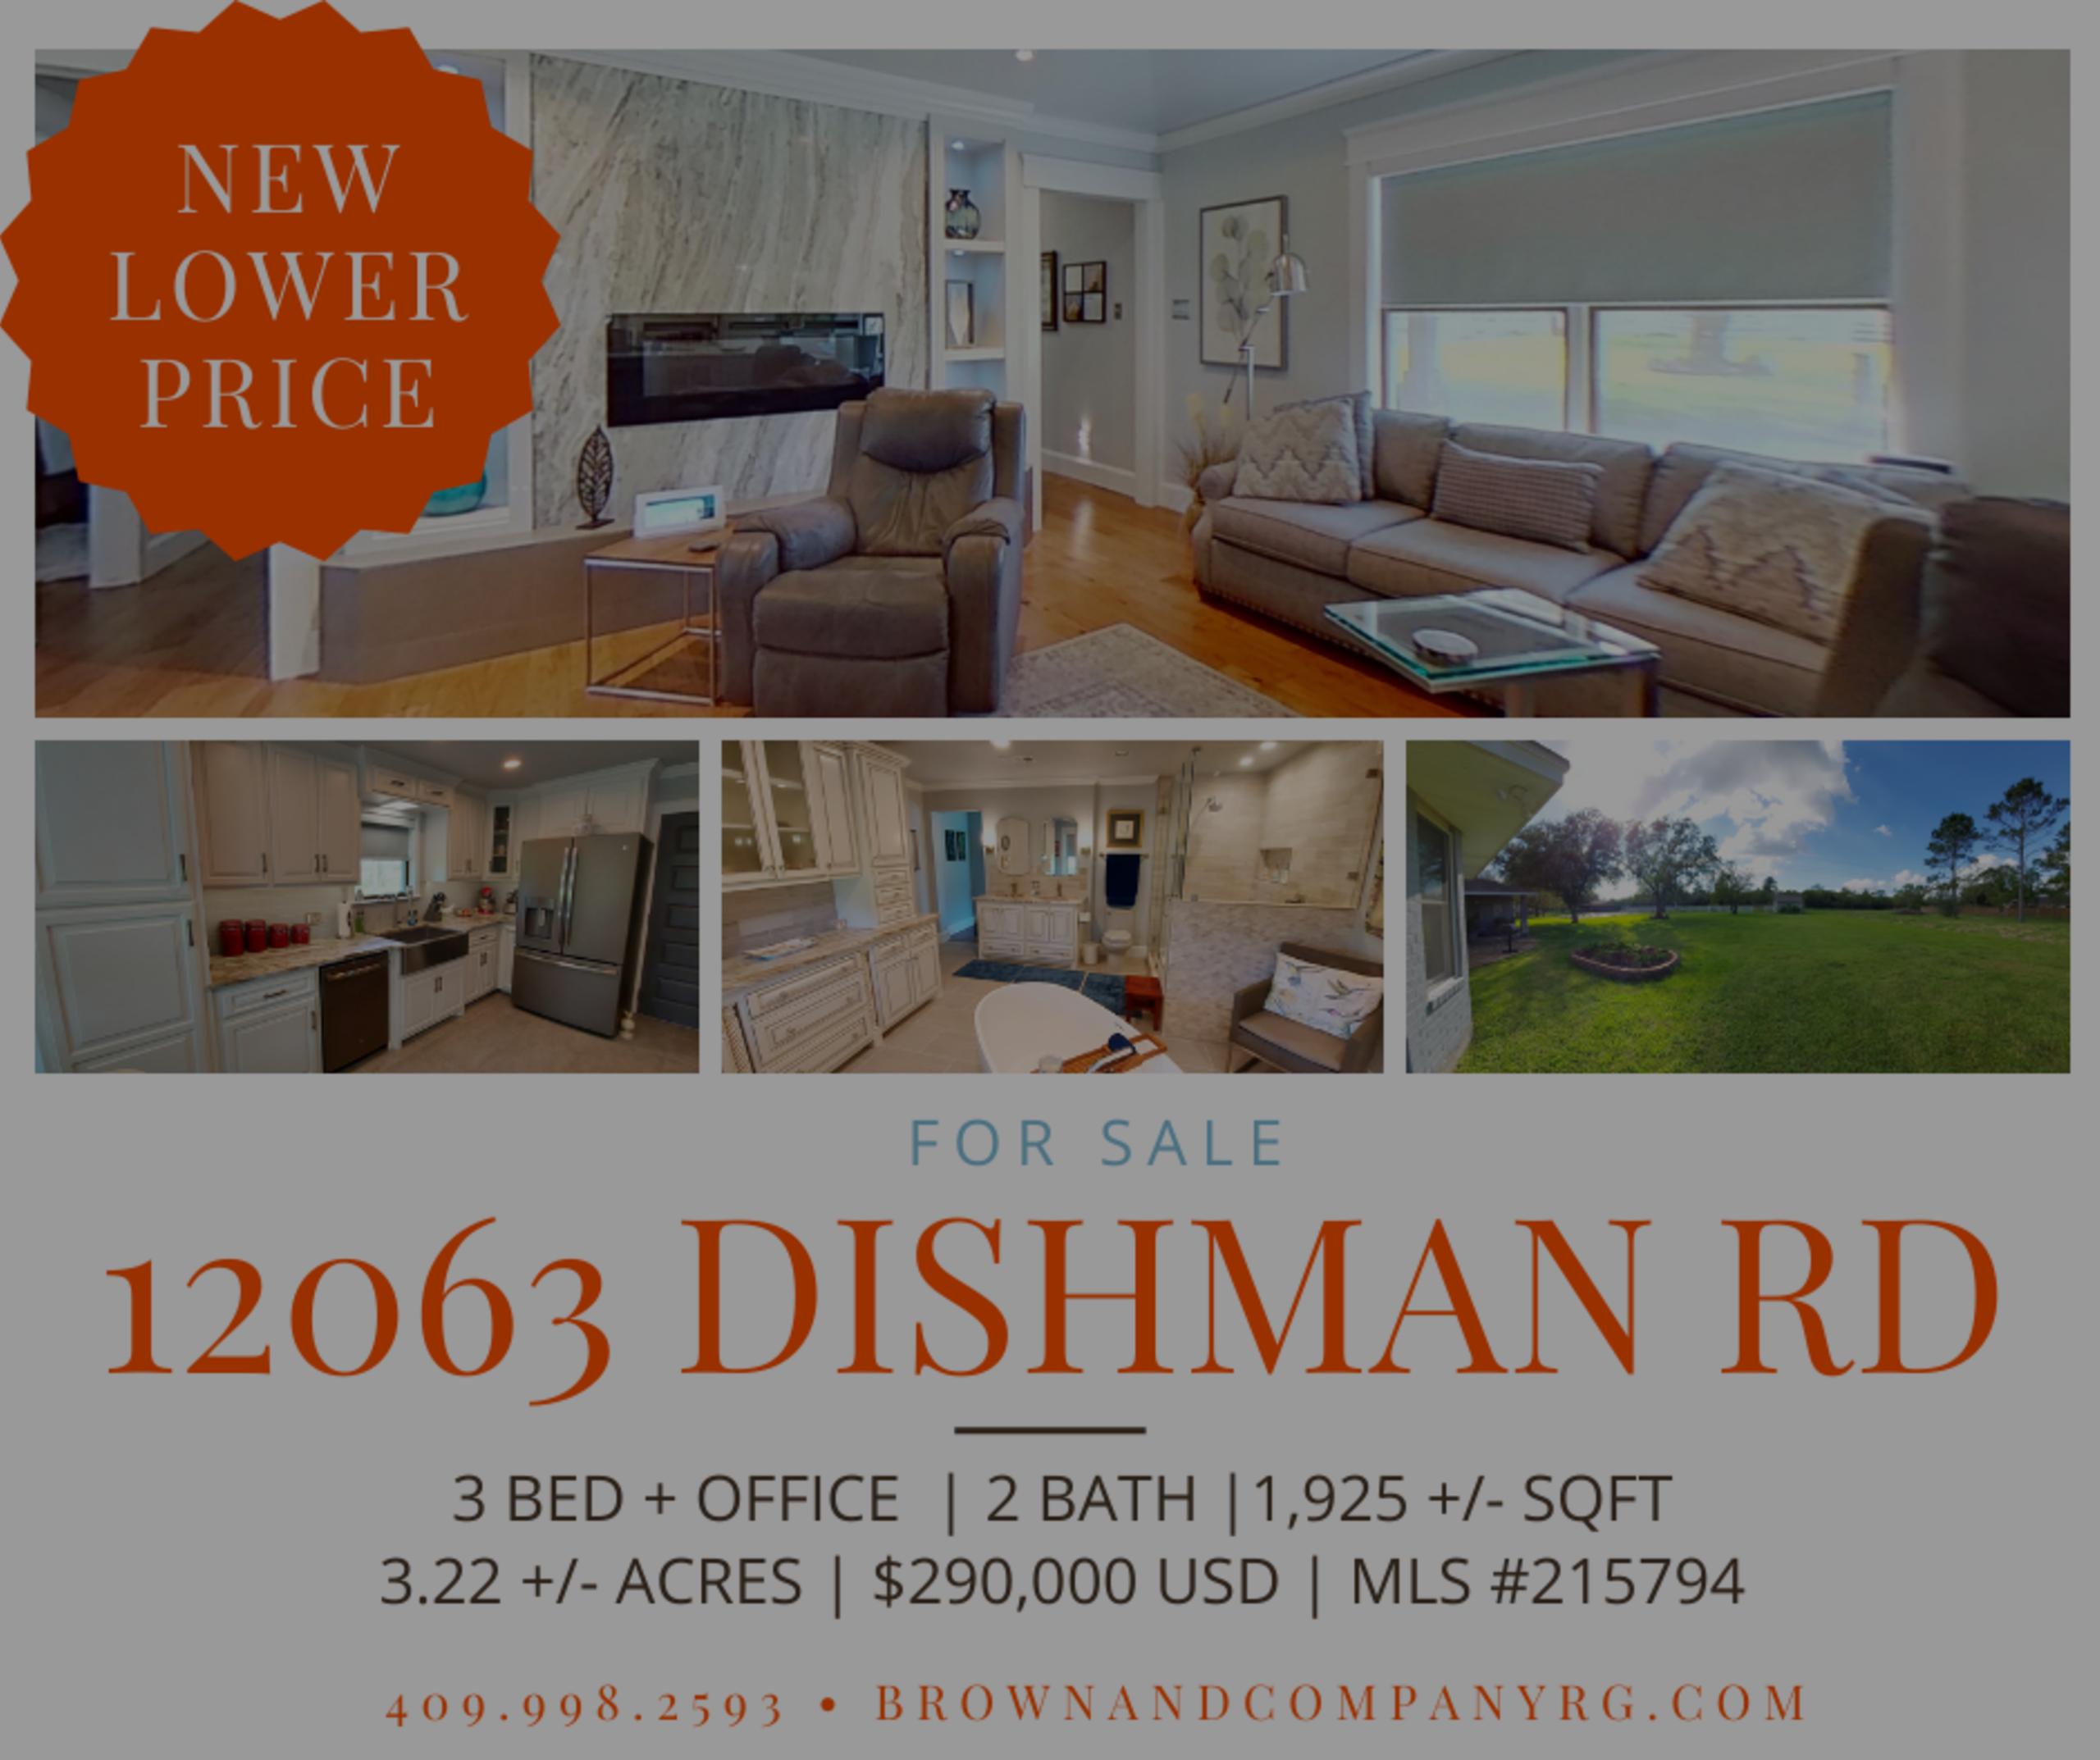 NEW PRICE ALERT | 12063 Dishman Rd | Beaumont TX 77713